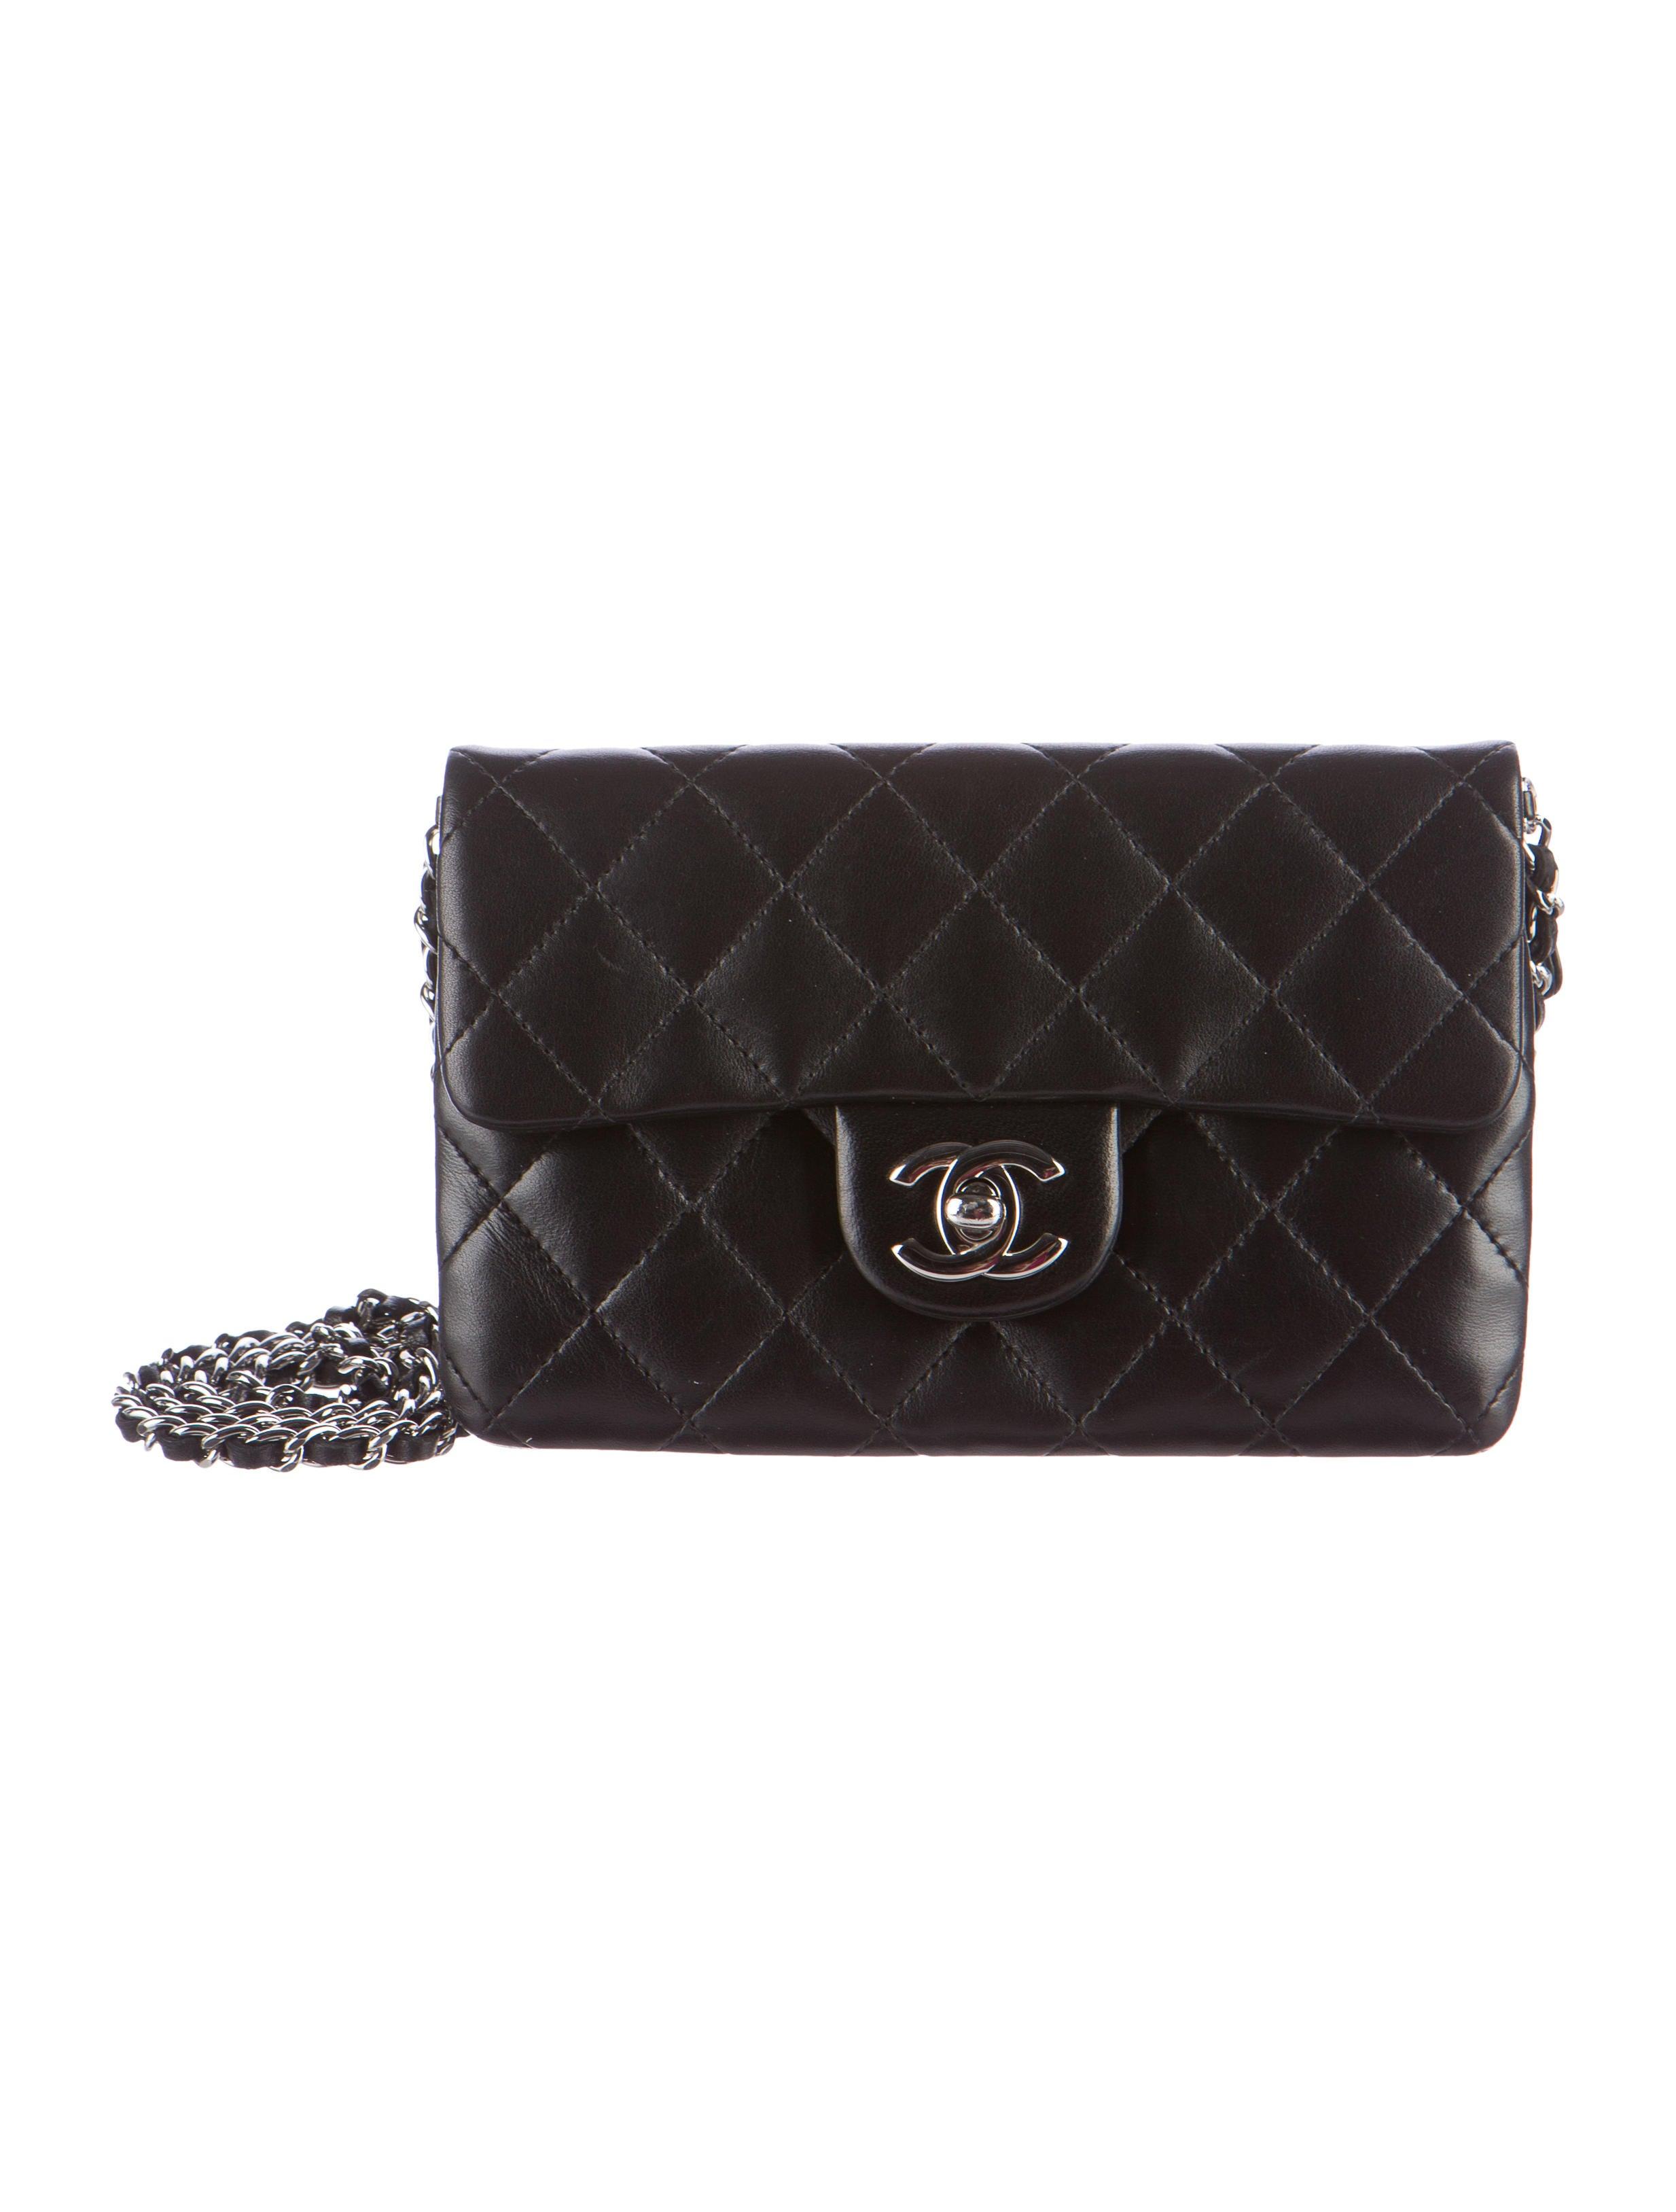 7cc16216d561 Chanel Daily Zippy Crossbody Bag - Handbags - CHA177178